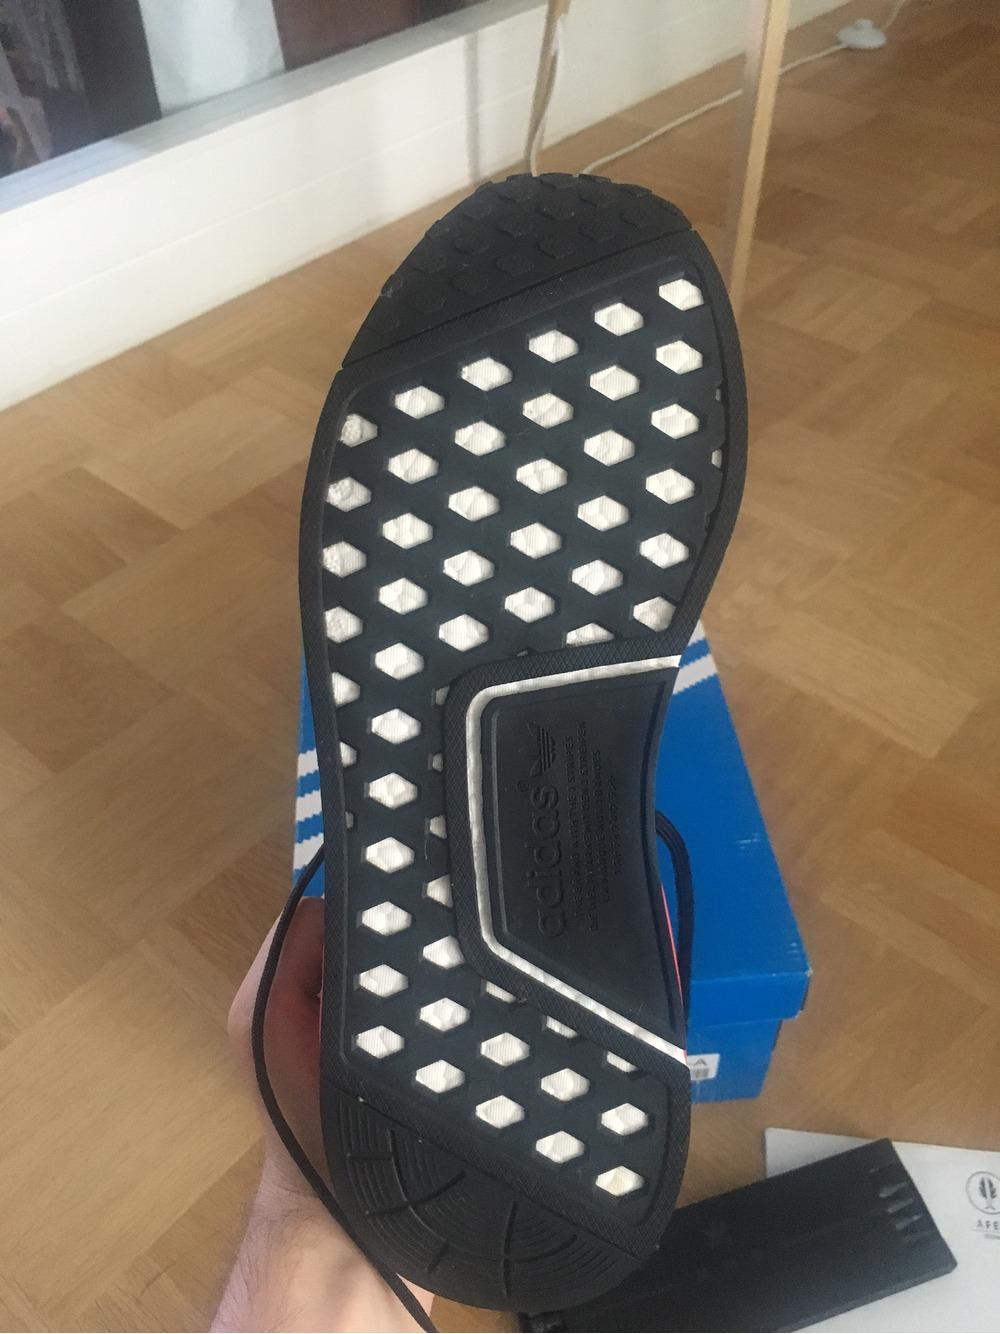 Adidas NMD RUNNER PK PRIMEKNIT OG NOMAD - photo 5/5